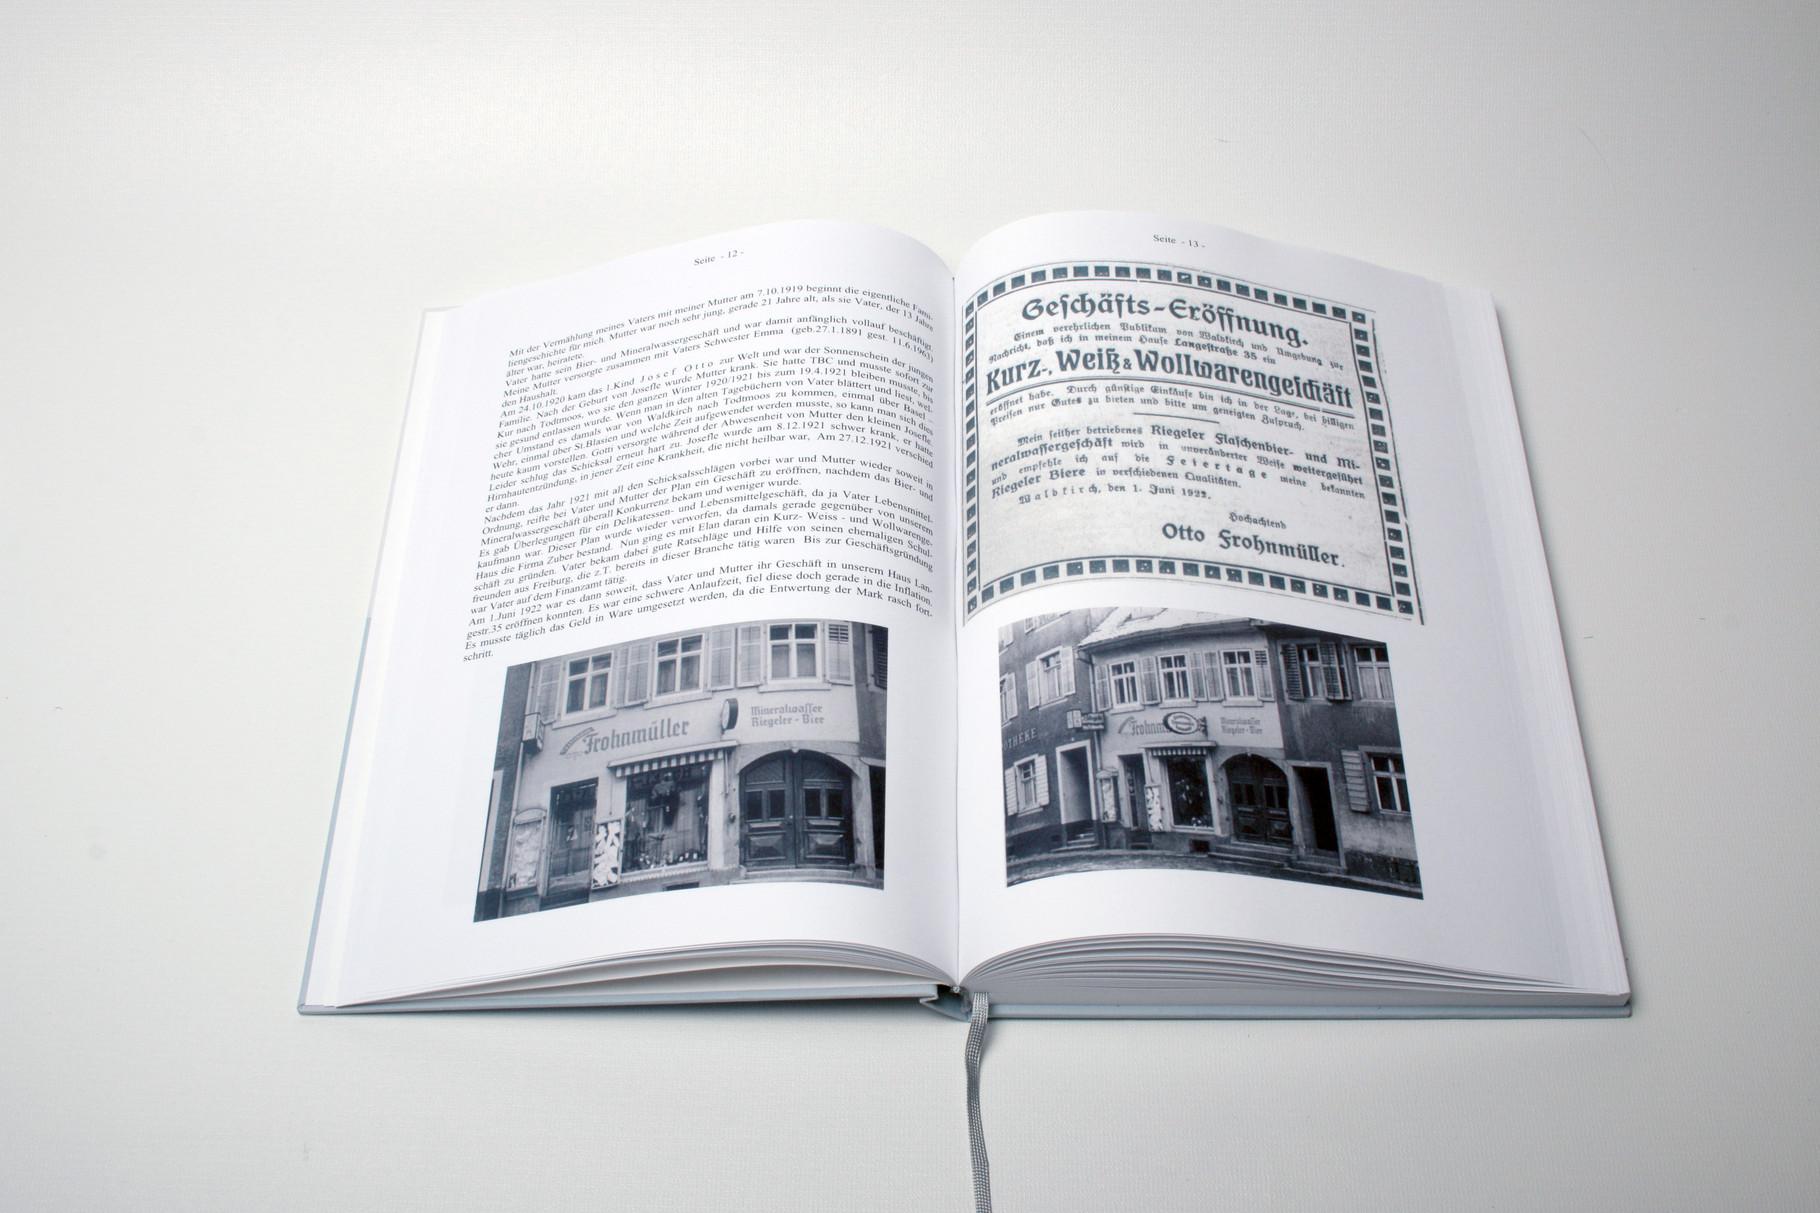 Personaliserter Buchdruck